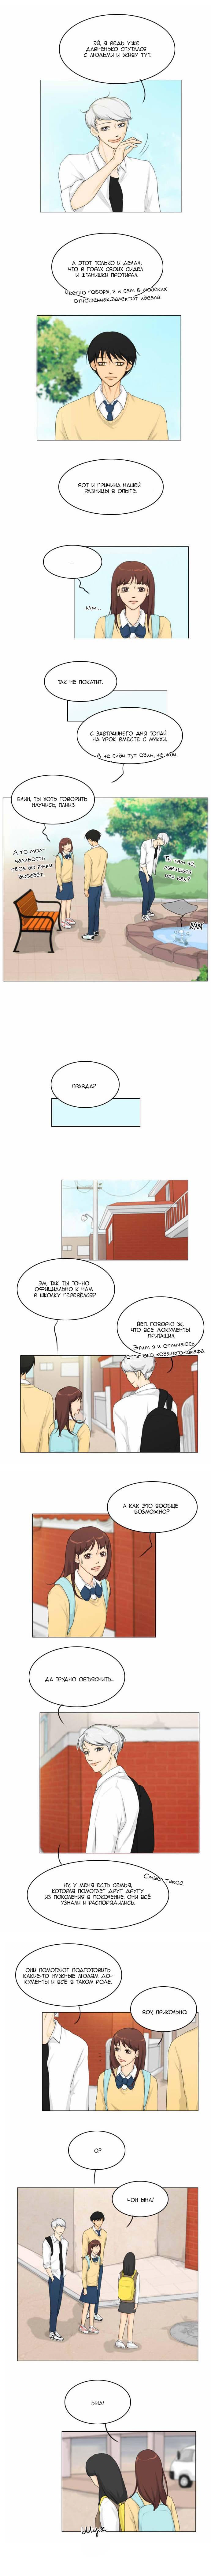 https://r1.ninemanga.com/comics/pic2/8/31048/426331/153504417068.jpg Page 3